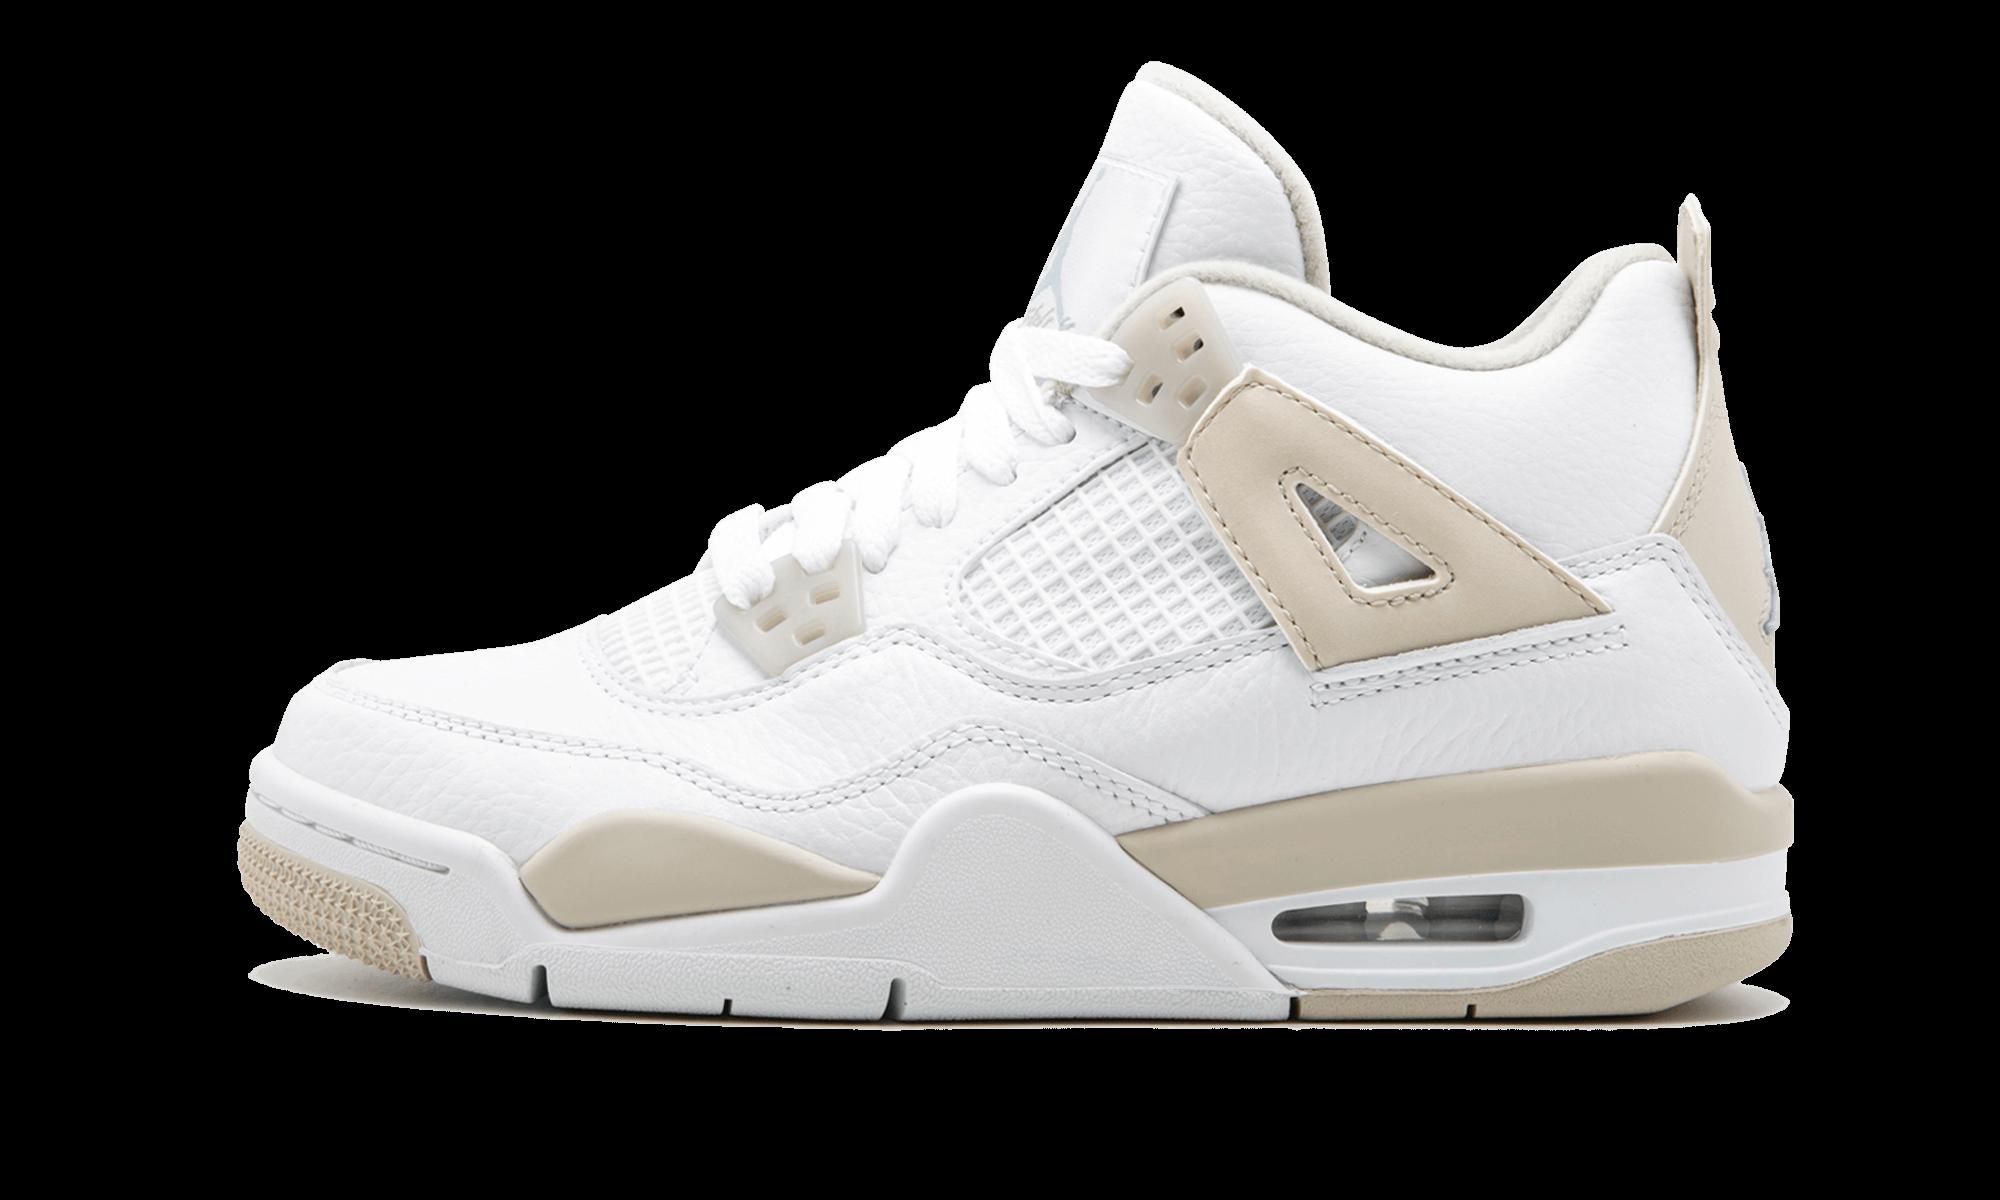 best sneakers 54447 2fe17 Air Jordan 4 Retro GG - 487724 118 in 2019 | For the Feet ...